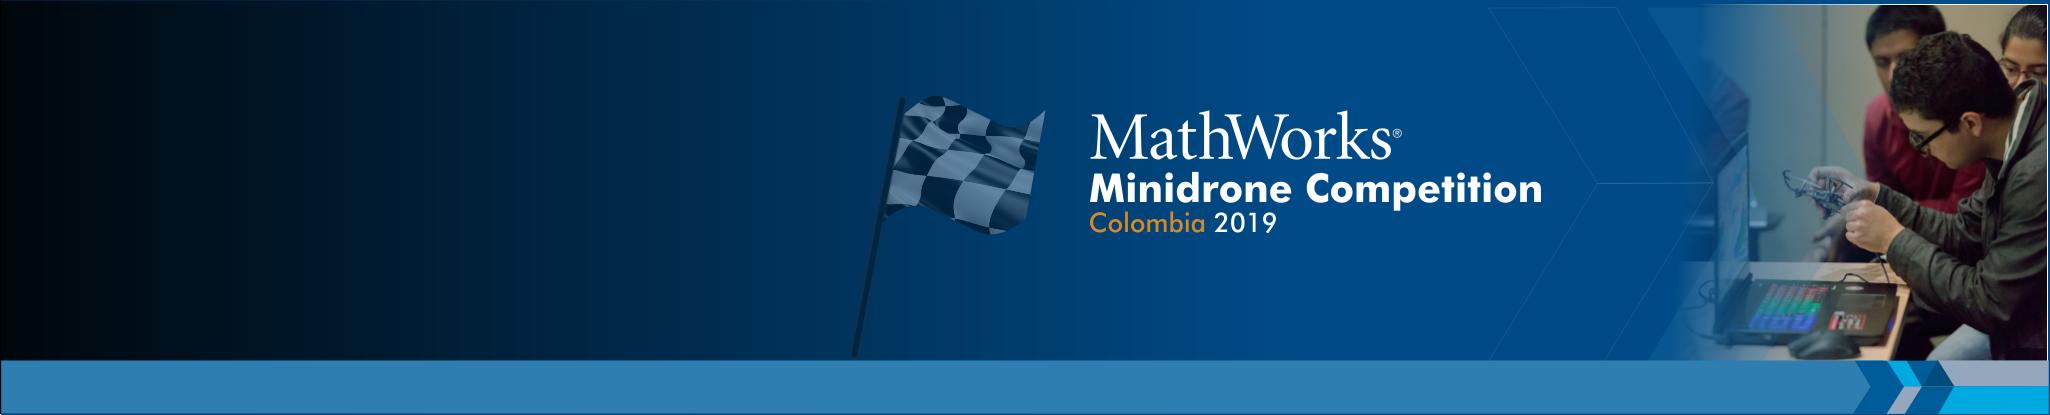 MathWorks_Minidrones_Competition_2019